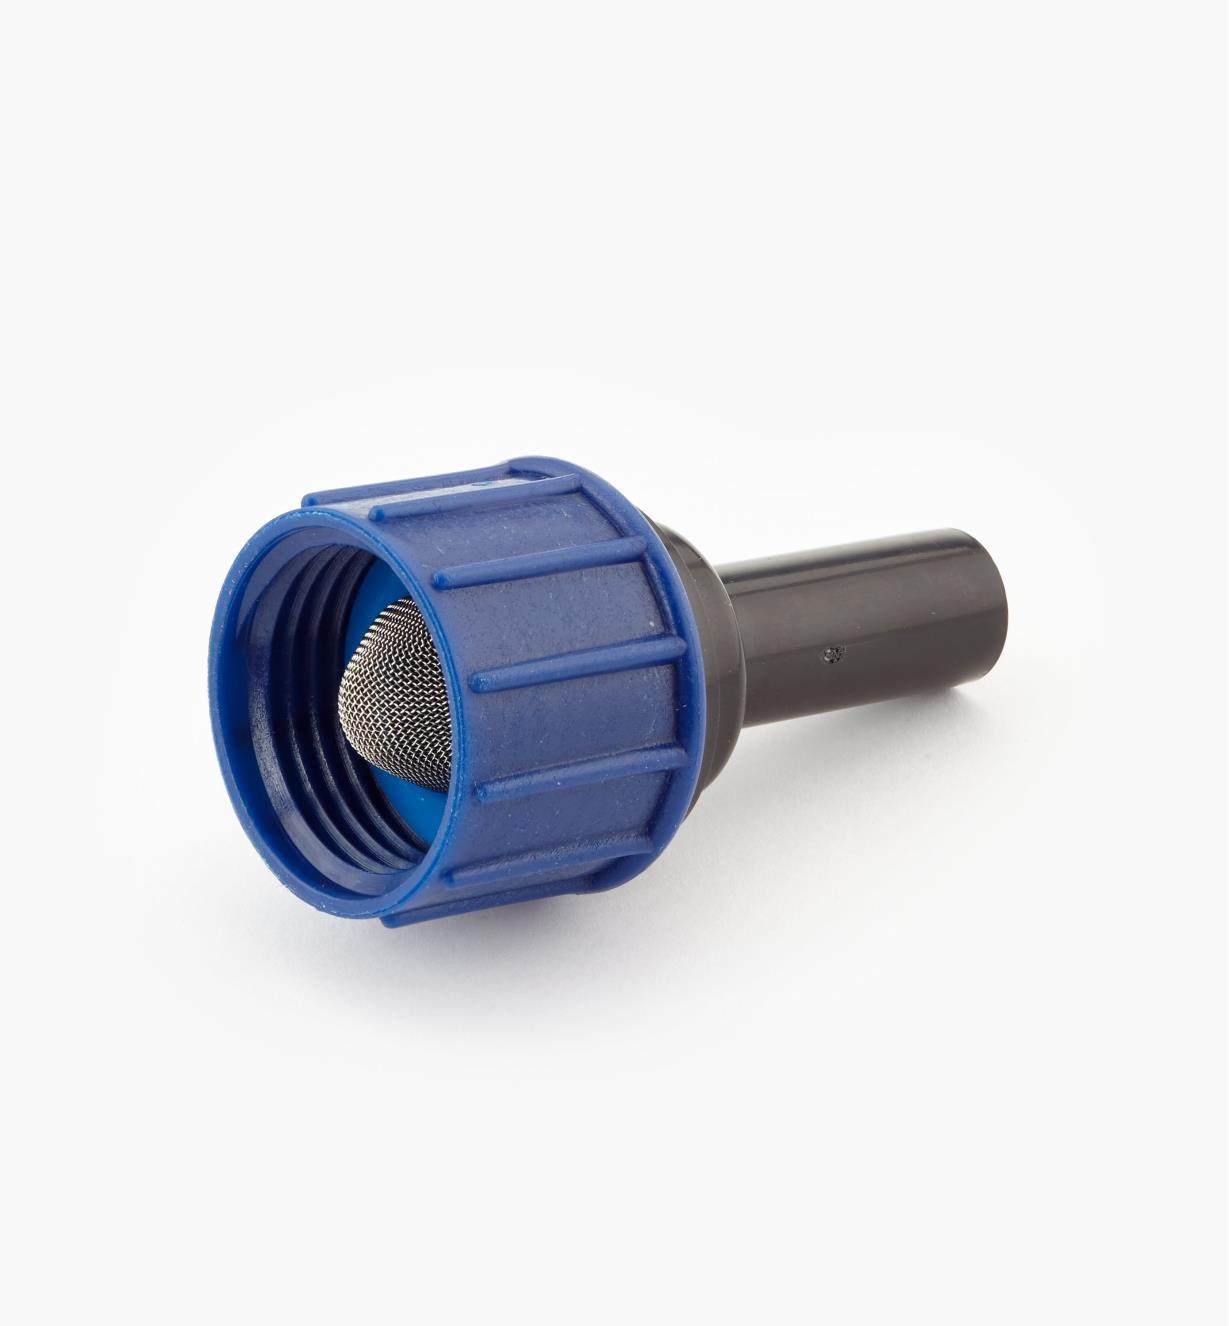 XC245 - Raccord tuyau-robinet de 1/4po, l'unité